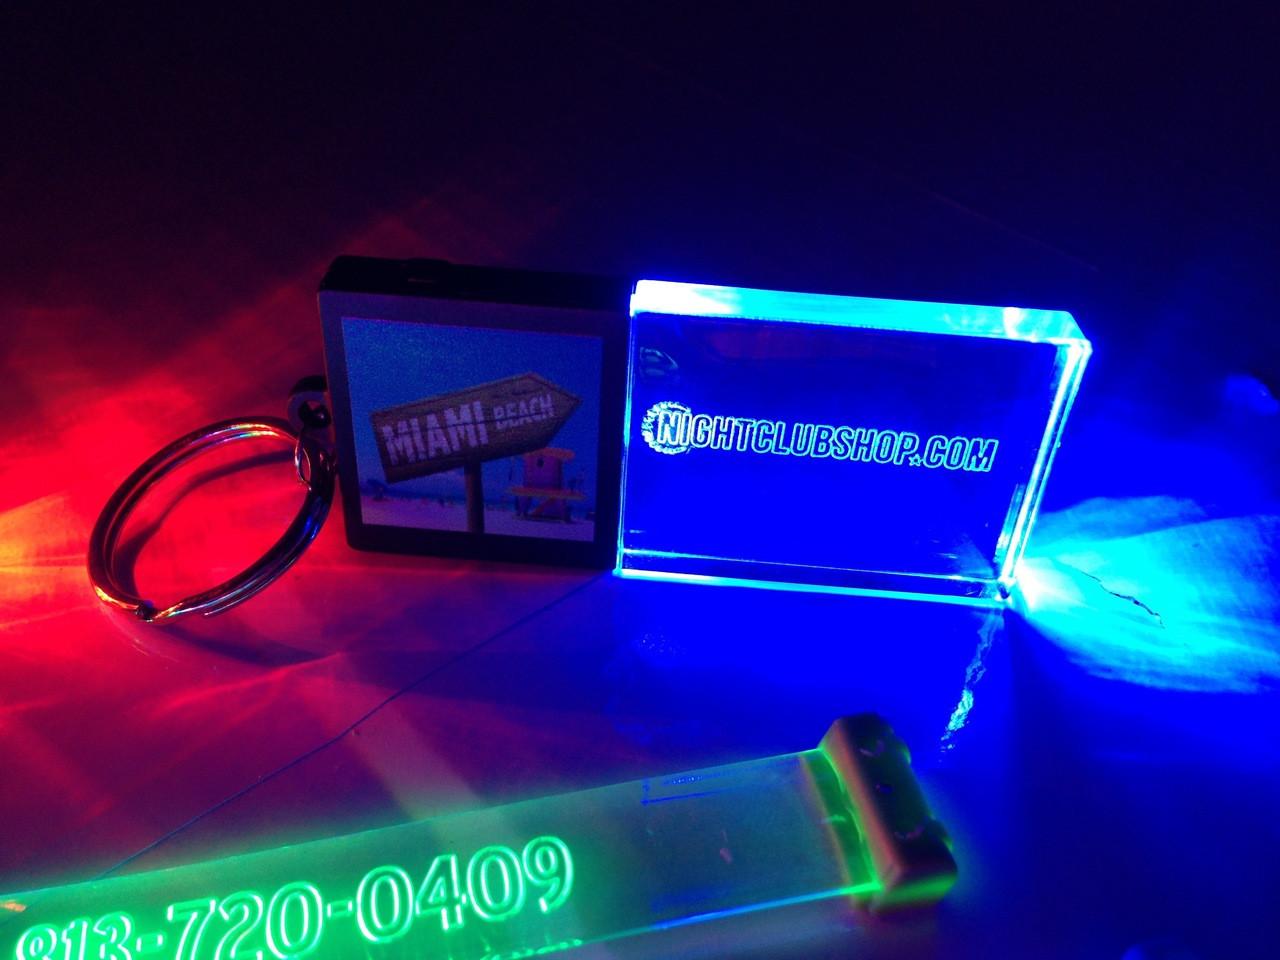 Nightclubshop,LED,Keychain,Key,chain,LED keychain, custom, BEAM, dual, print,engraved, logo,text, laser engraved,personalized,promo,merch,fundraiser,nightclub,fund raiser